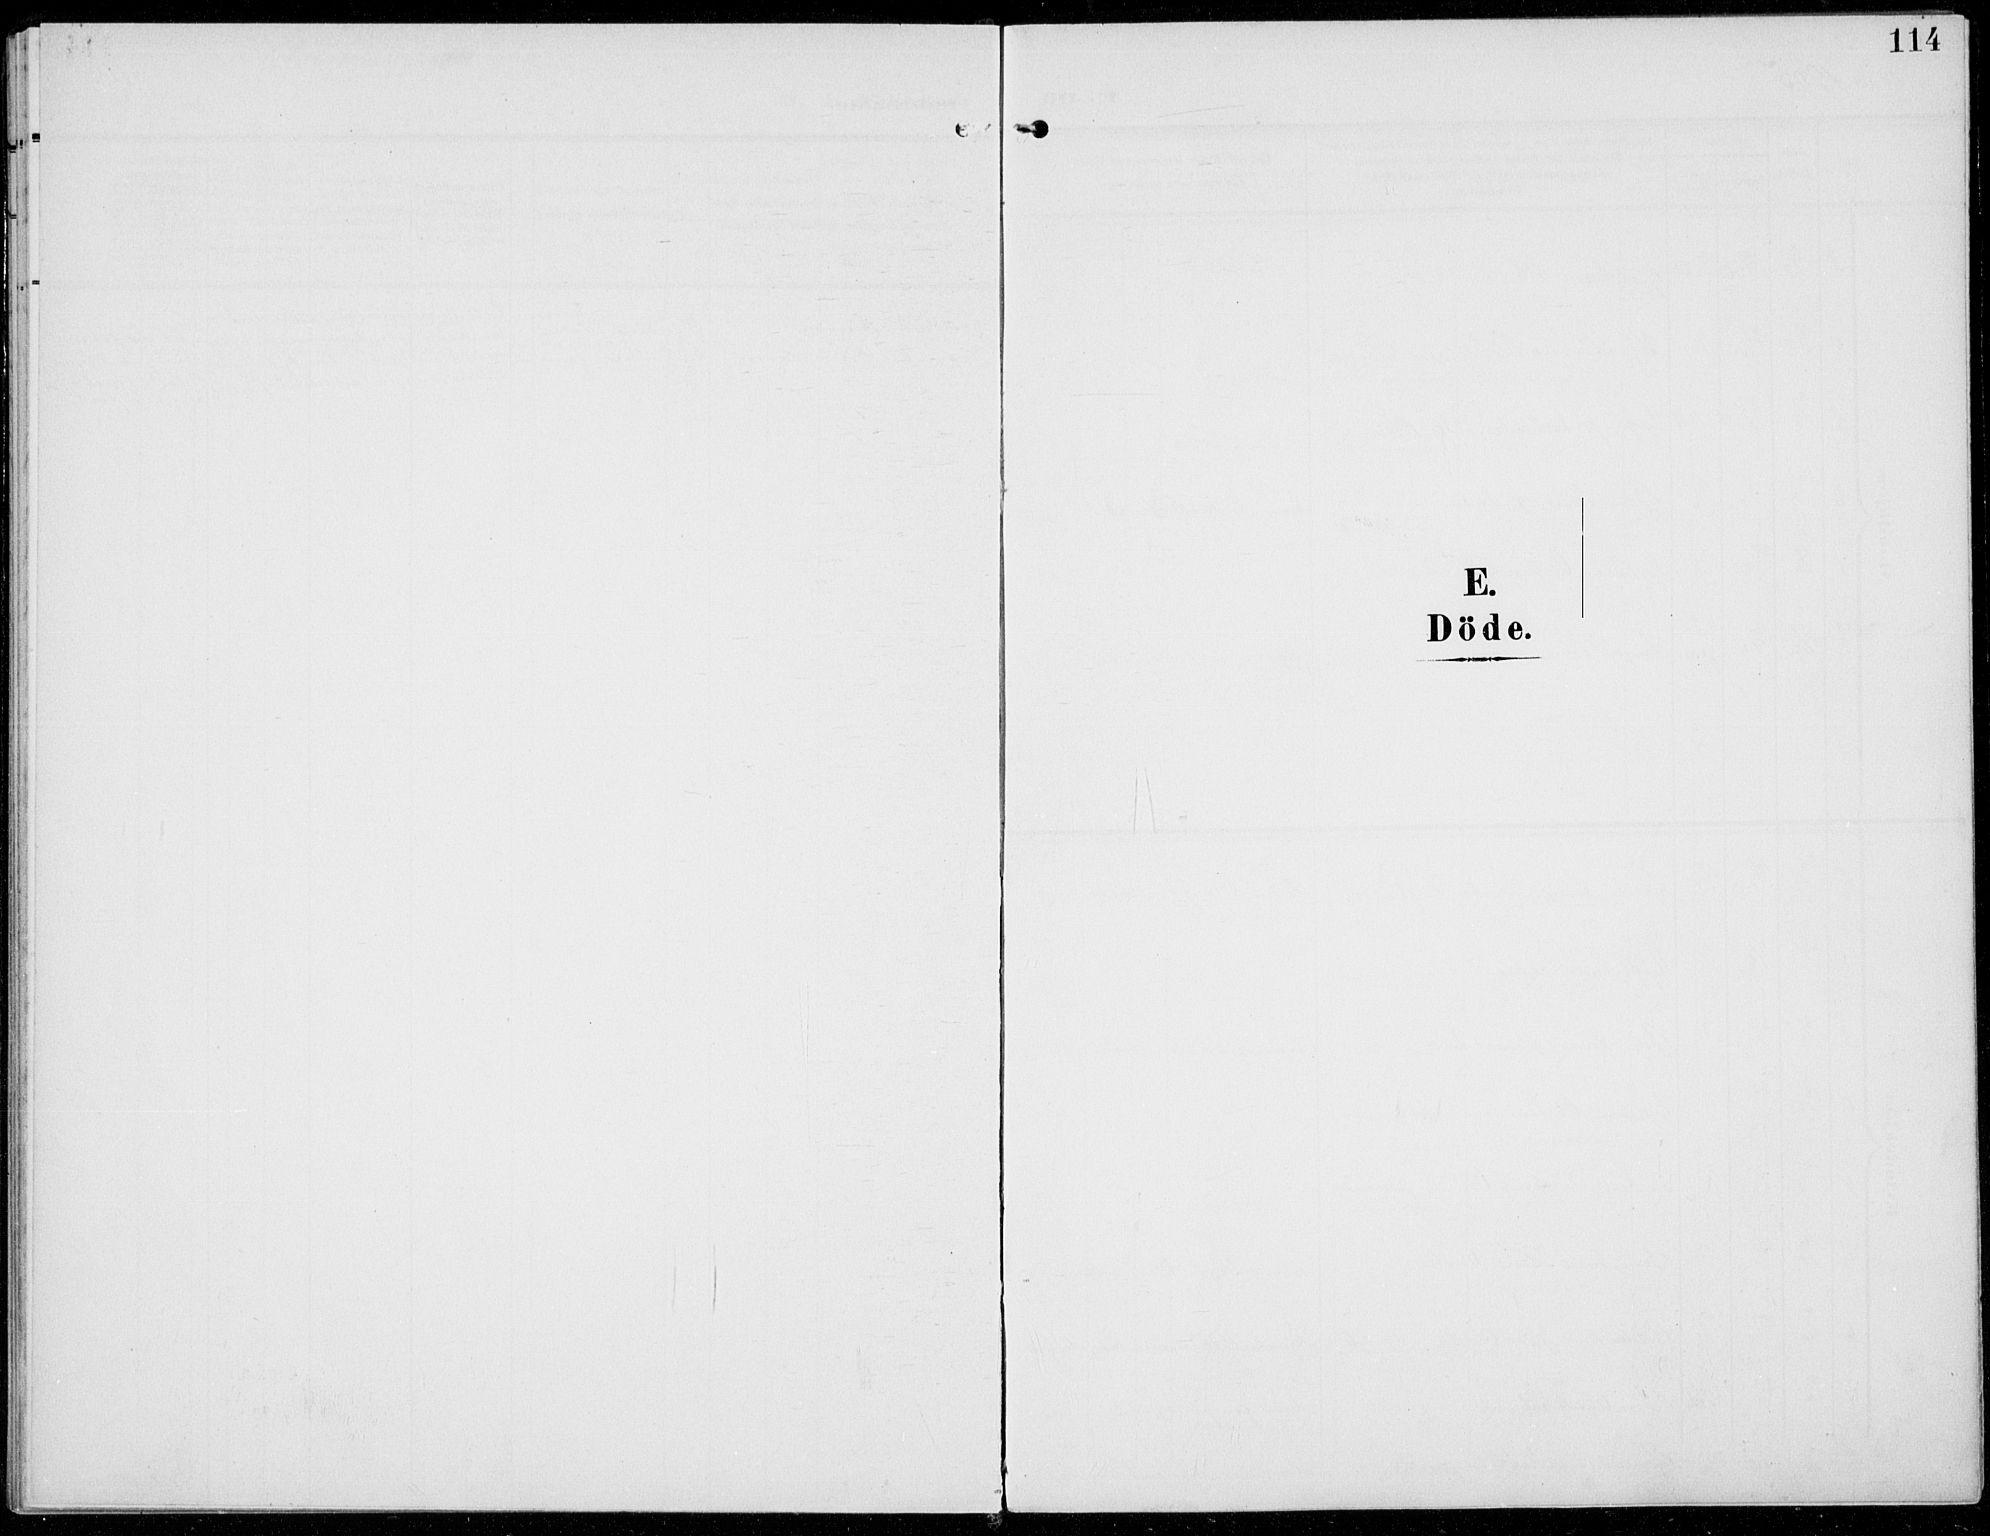 SAH, Sel prestekontor, Ministerialbok nr. 1, 1905-1922, s. 114